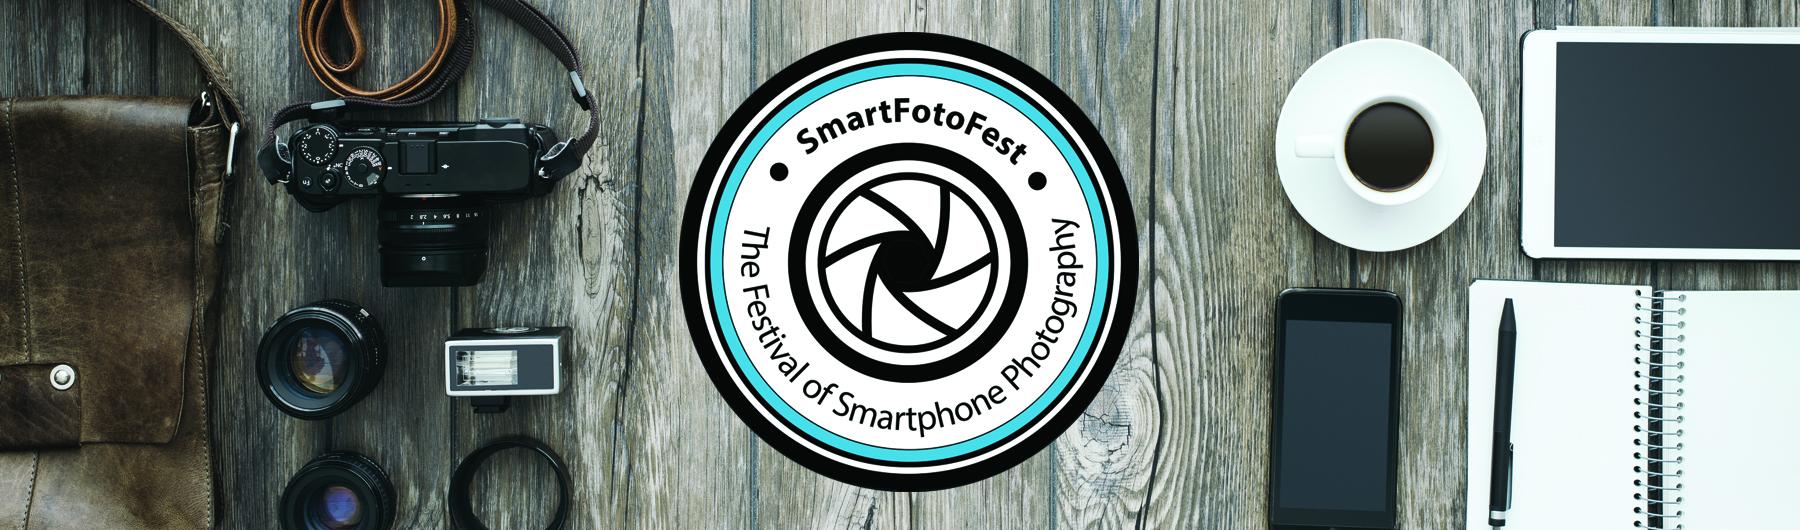 Smartfotofest